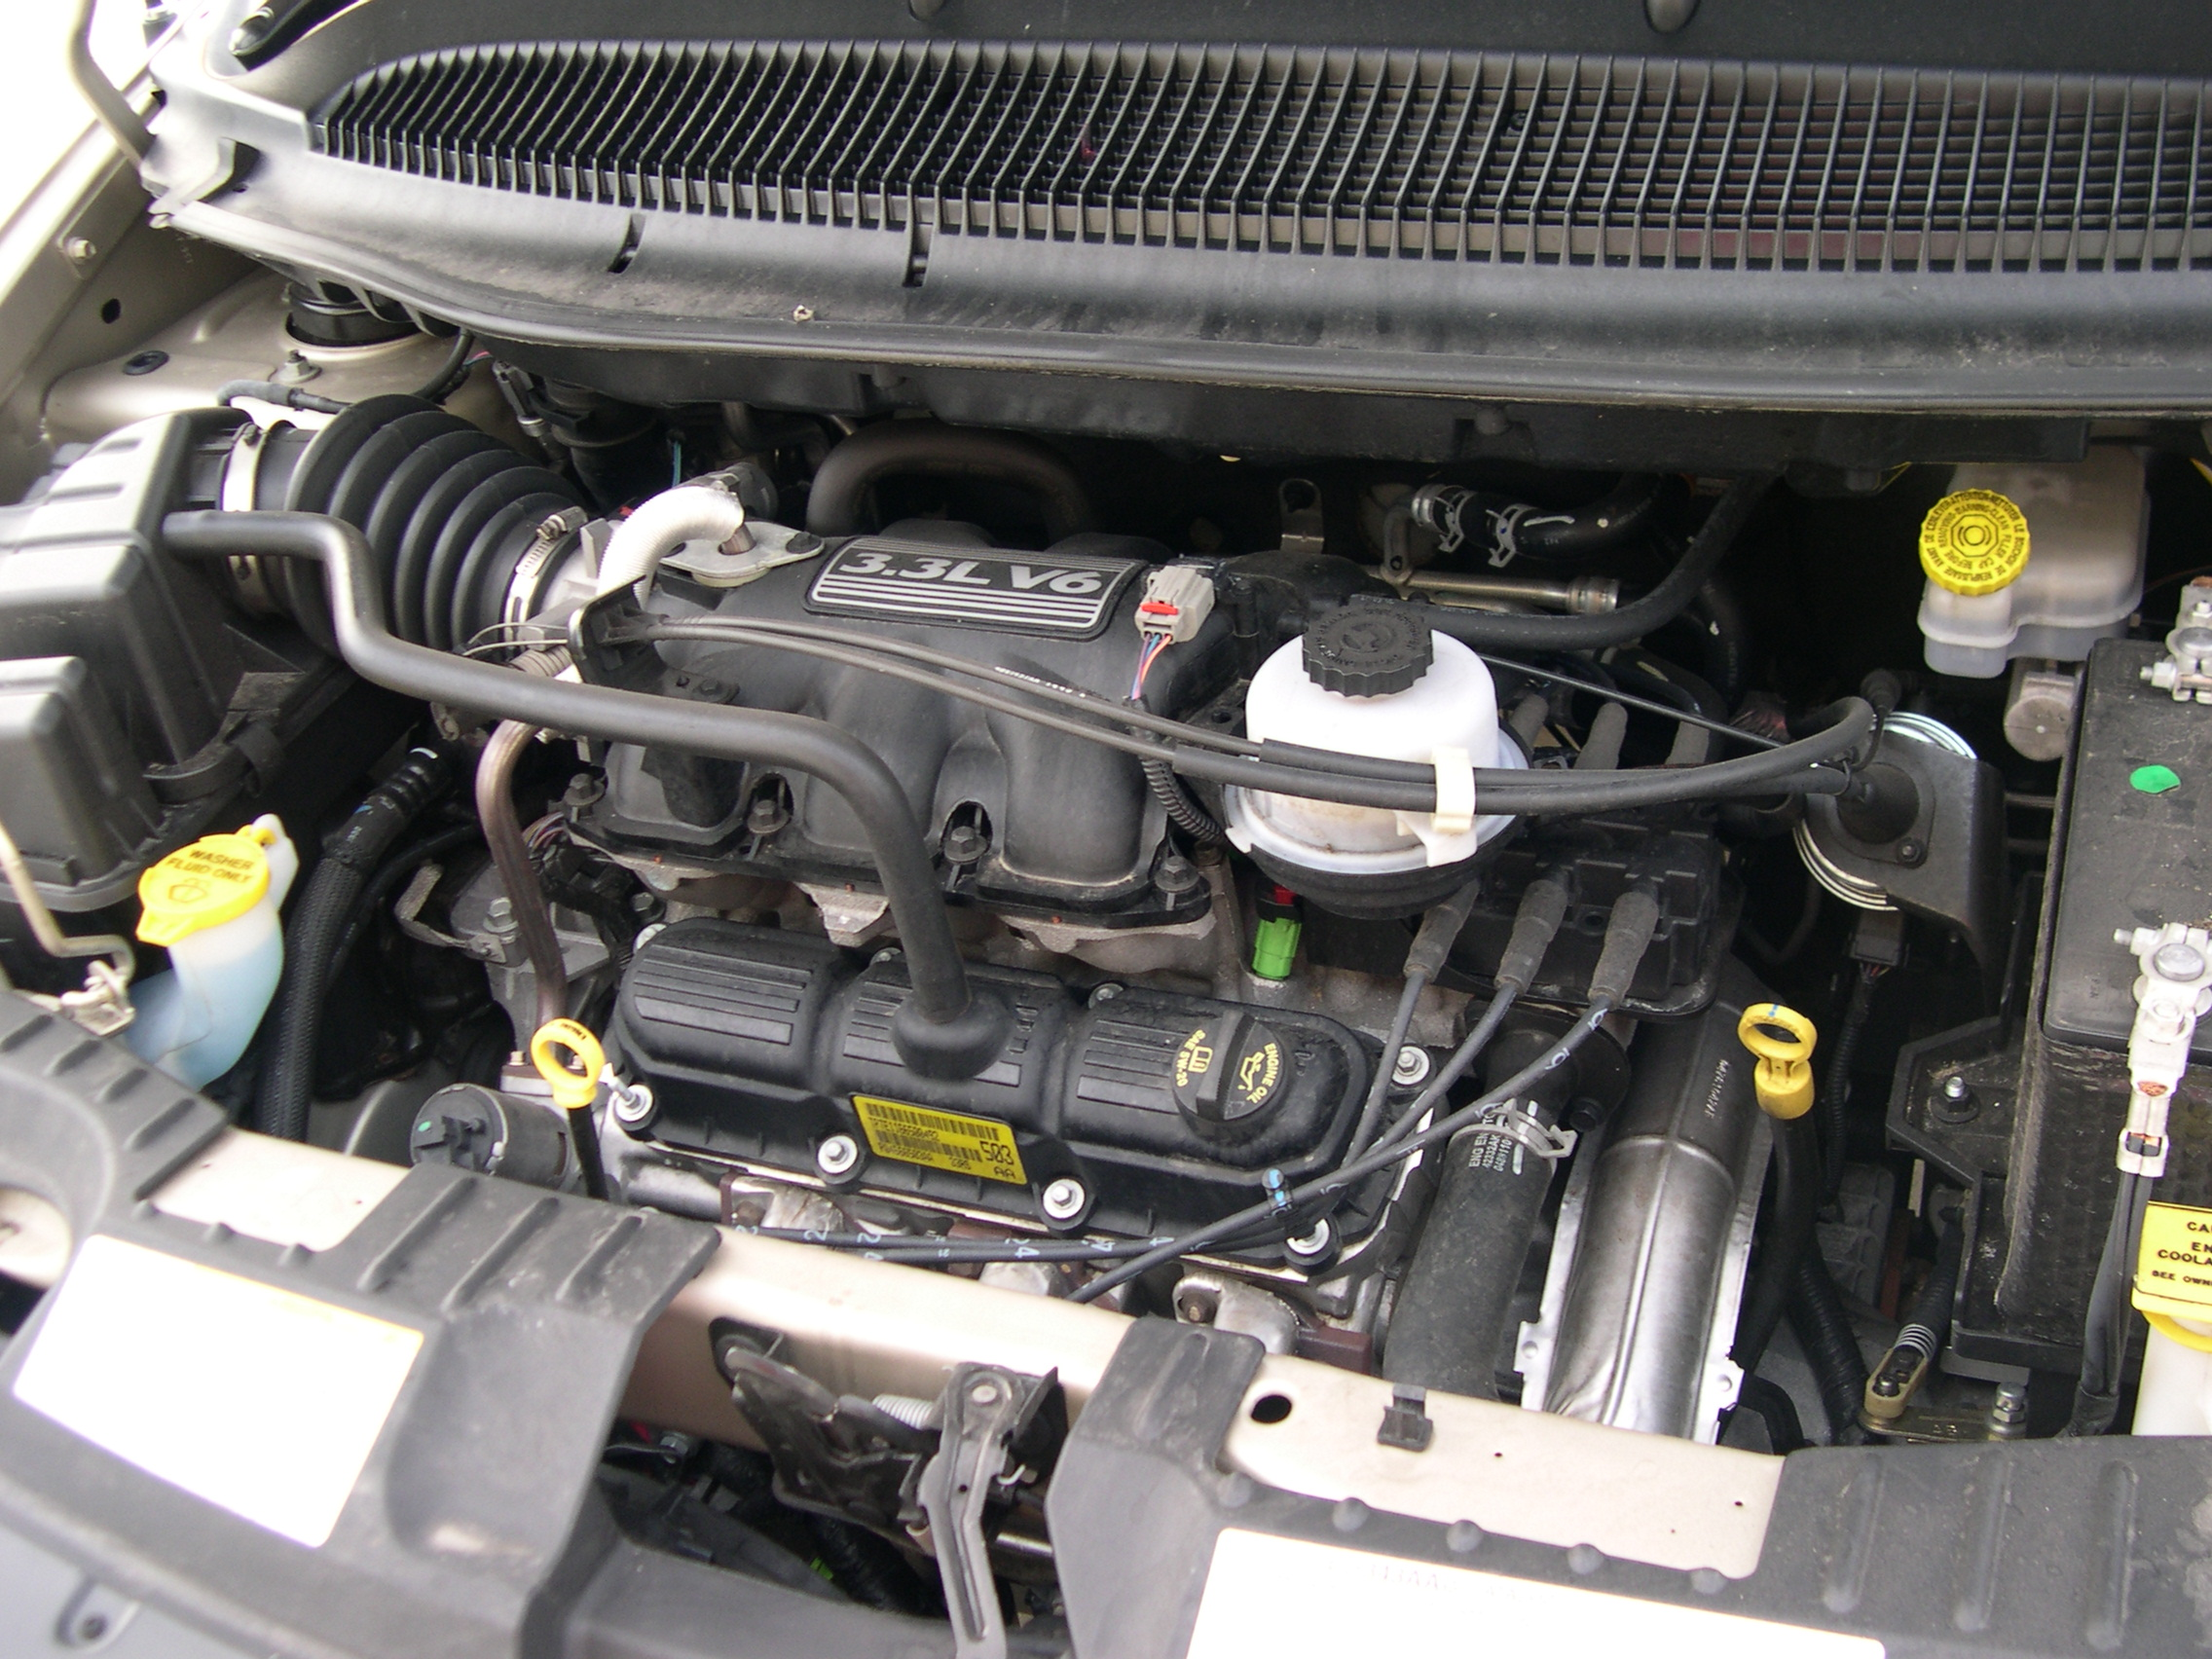 Miraculous Oldsmobile 3 8 Engine Diagram Basic Electronics Wiring Diagram Wiring Cloud Licukaidewilluminateatxorg